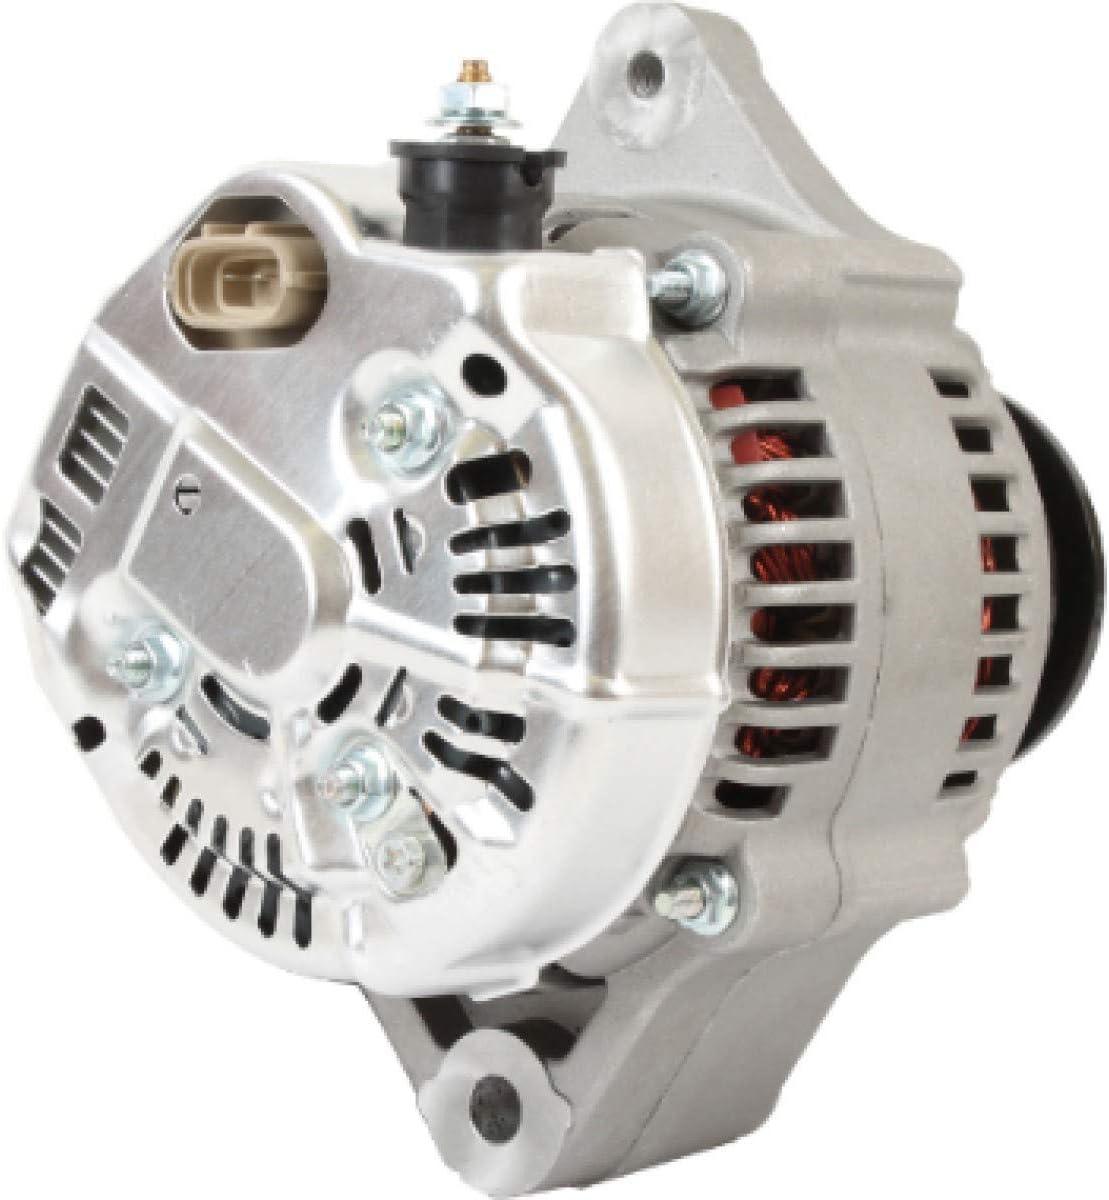 144-9963//102211-1830 New DENSO style Alternator For 302.5C 303 CR Caterpillar Mini Excavator S3L2 Mitsubishi Engine //0R9699 102211-9010//32868-03201